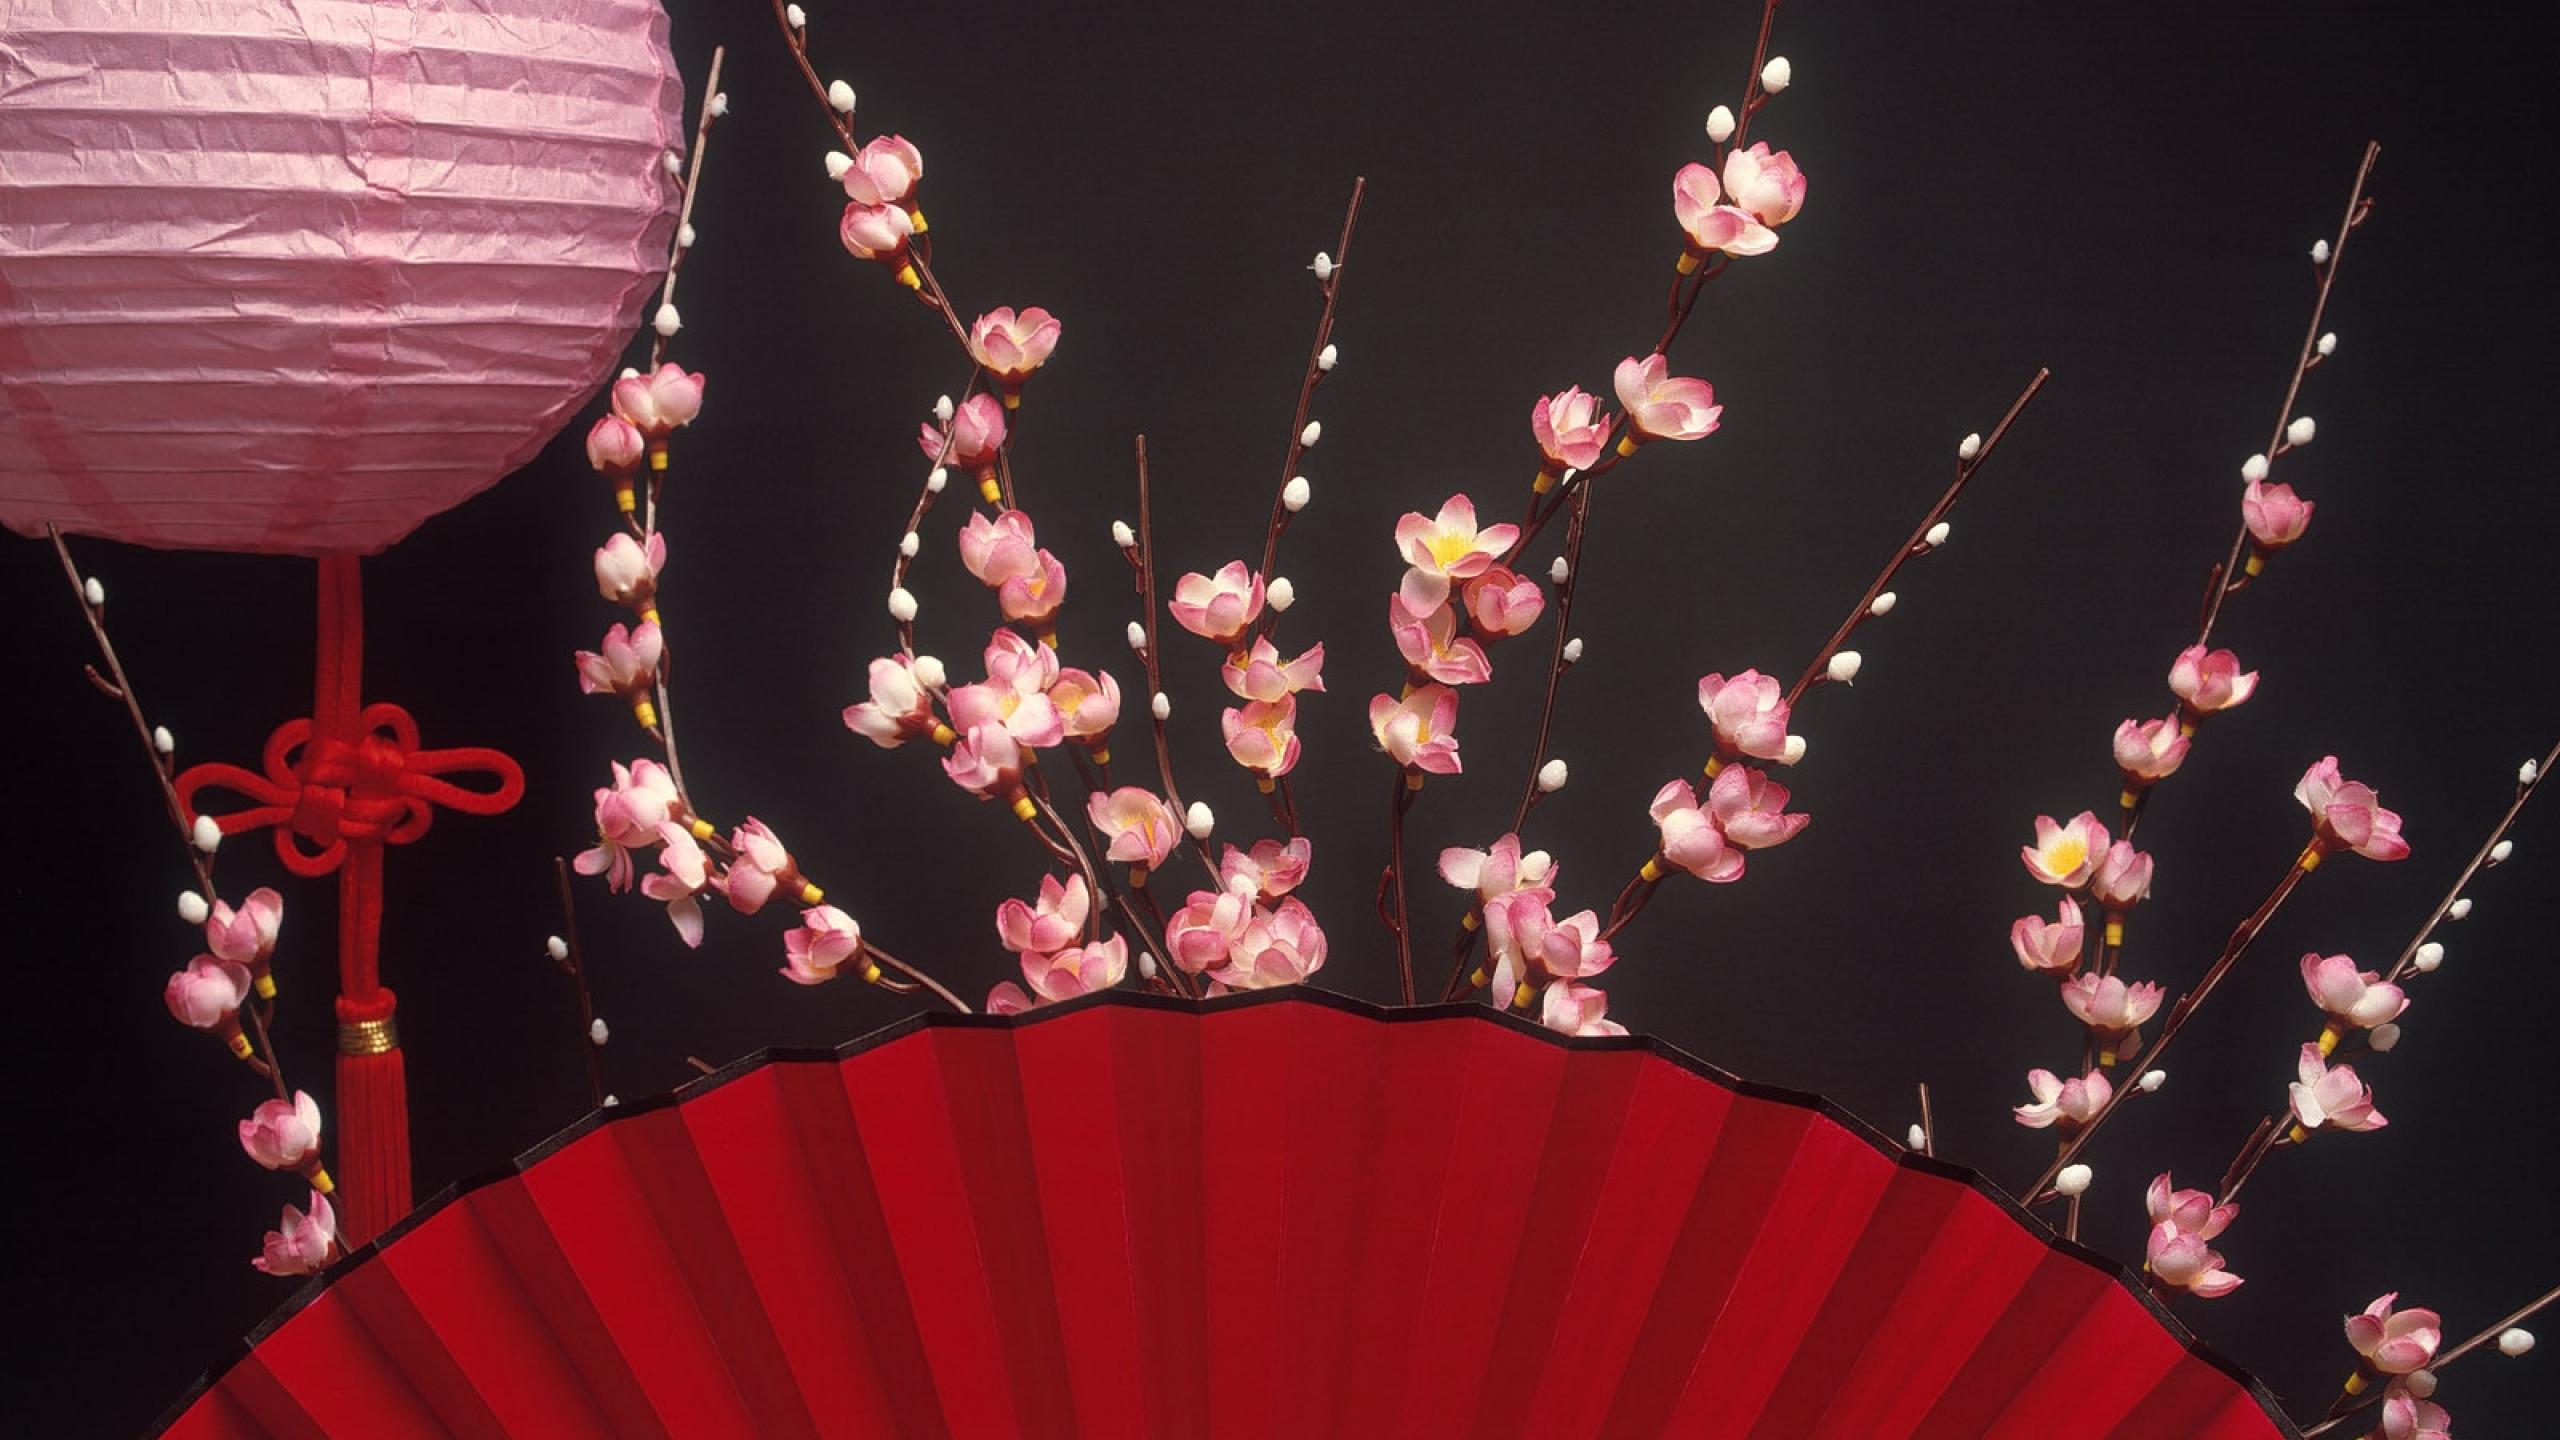 Chinese New Year 2014 Desktop Background   Wallpaper High 2560x1440